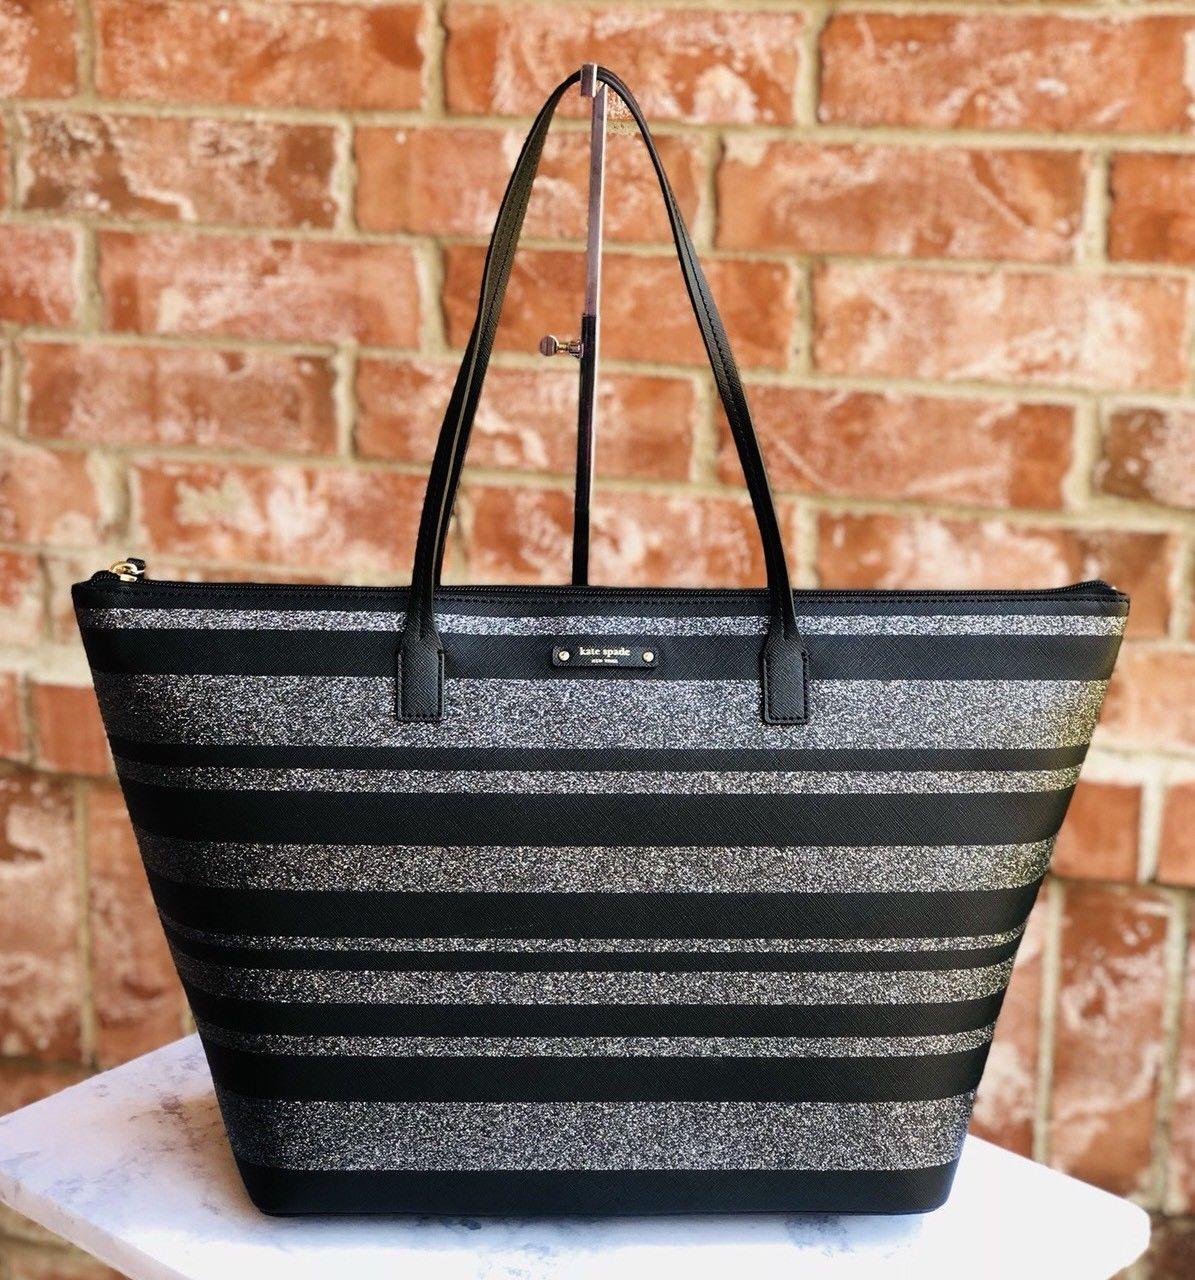 119 99 New Kate Spade Hani Haven Lane Large Tote Bag Black Glitter Stripe Handbag